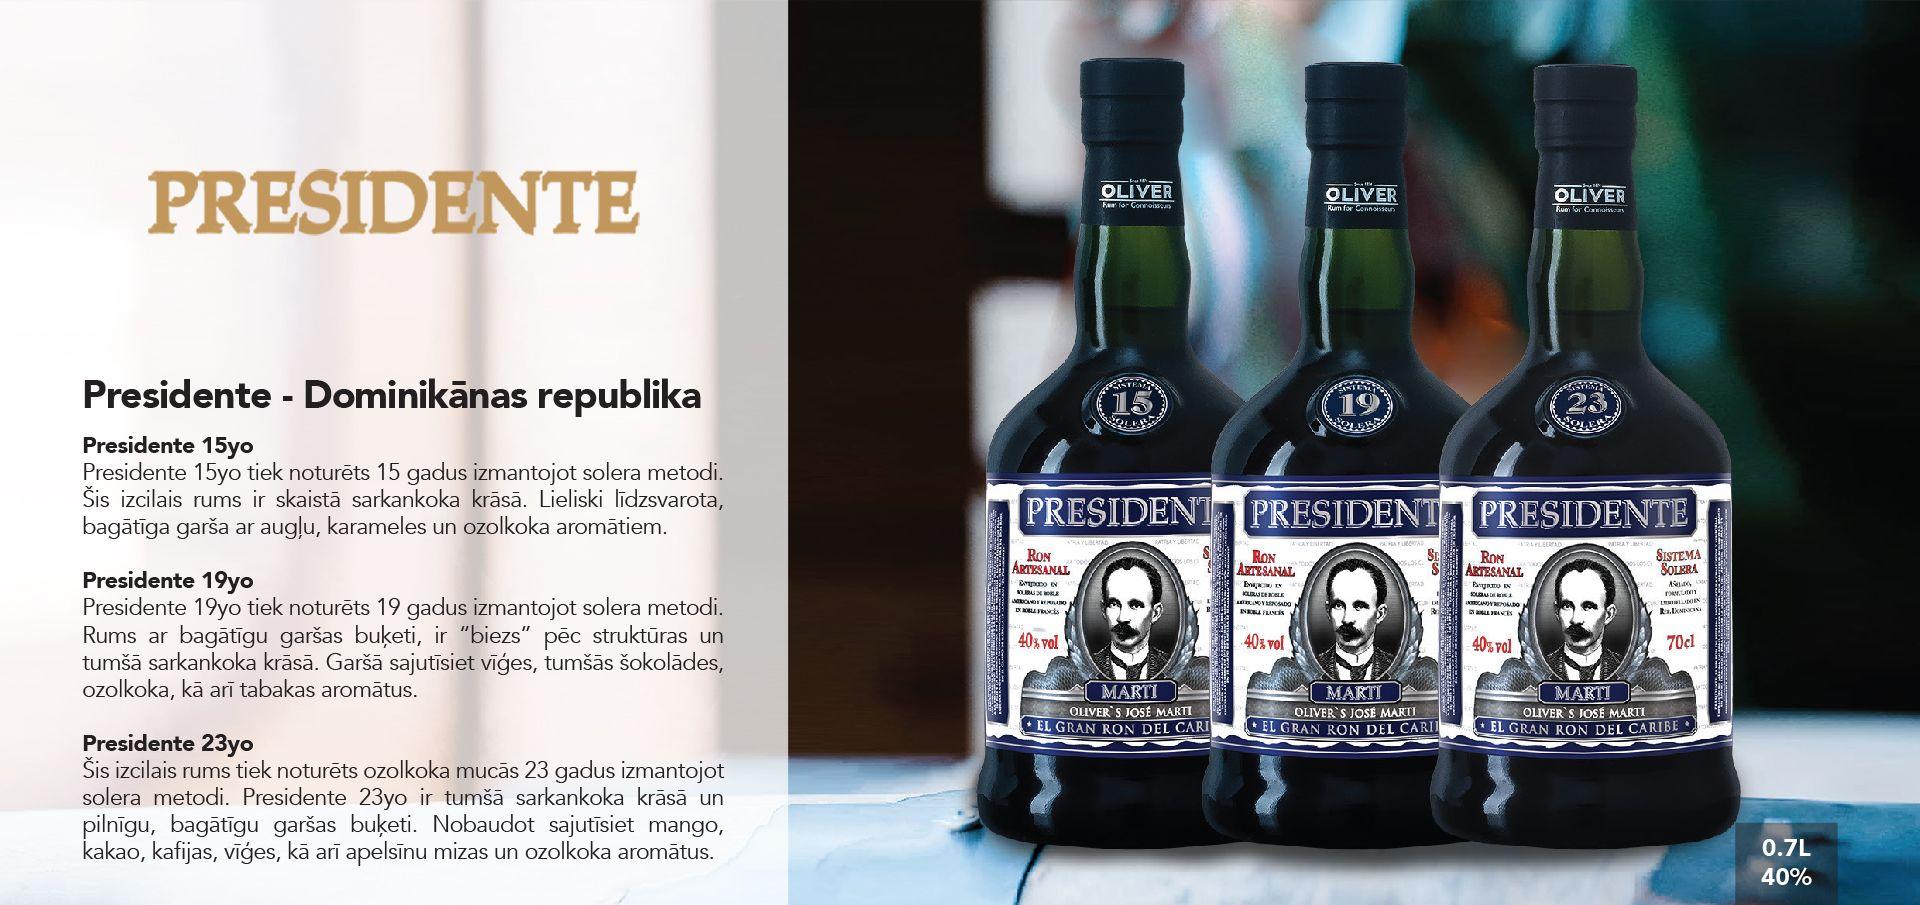 Presidente Rum - Dominikānas republika